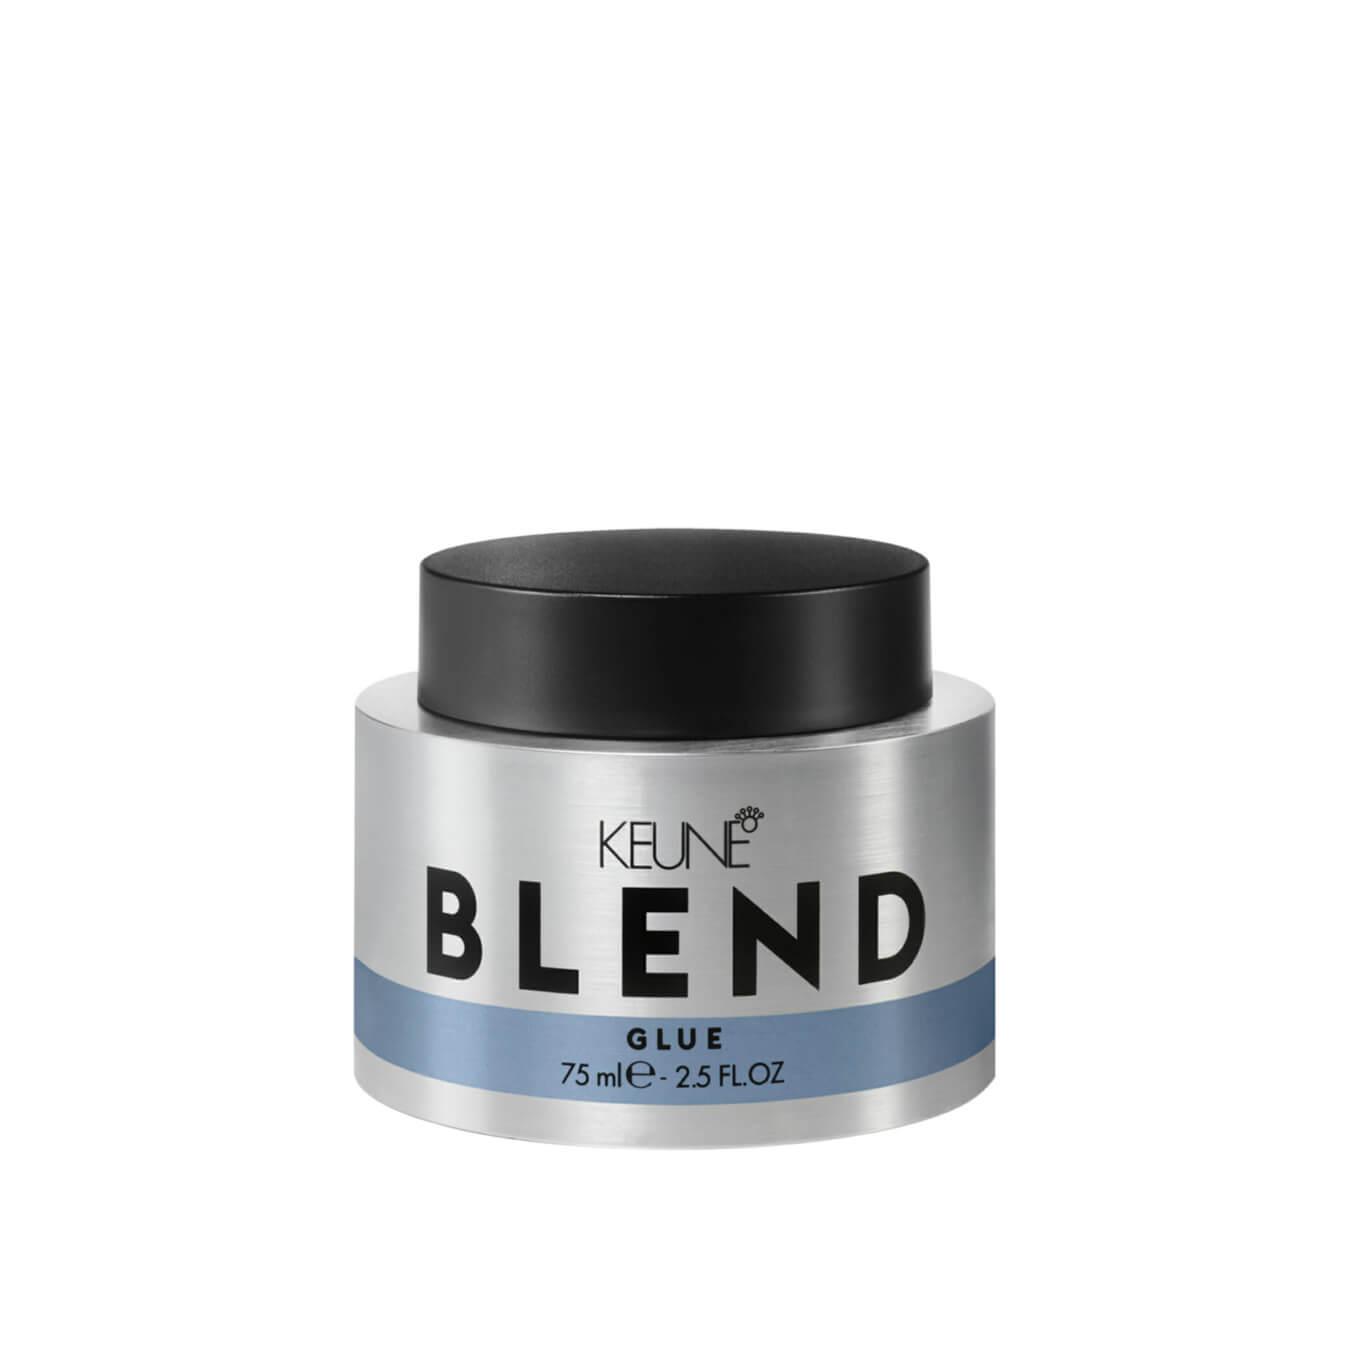 Koop Keune Blend Glue 75ml